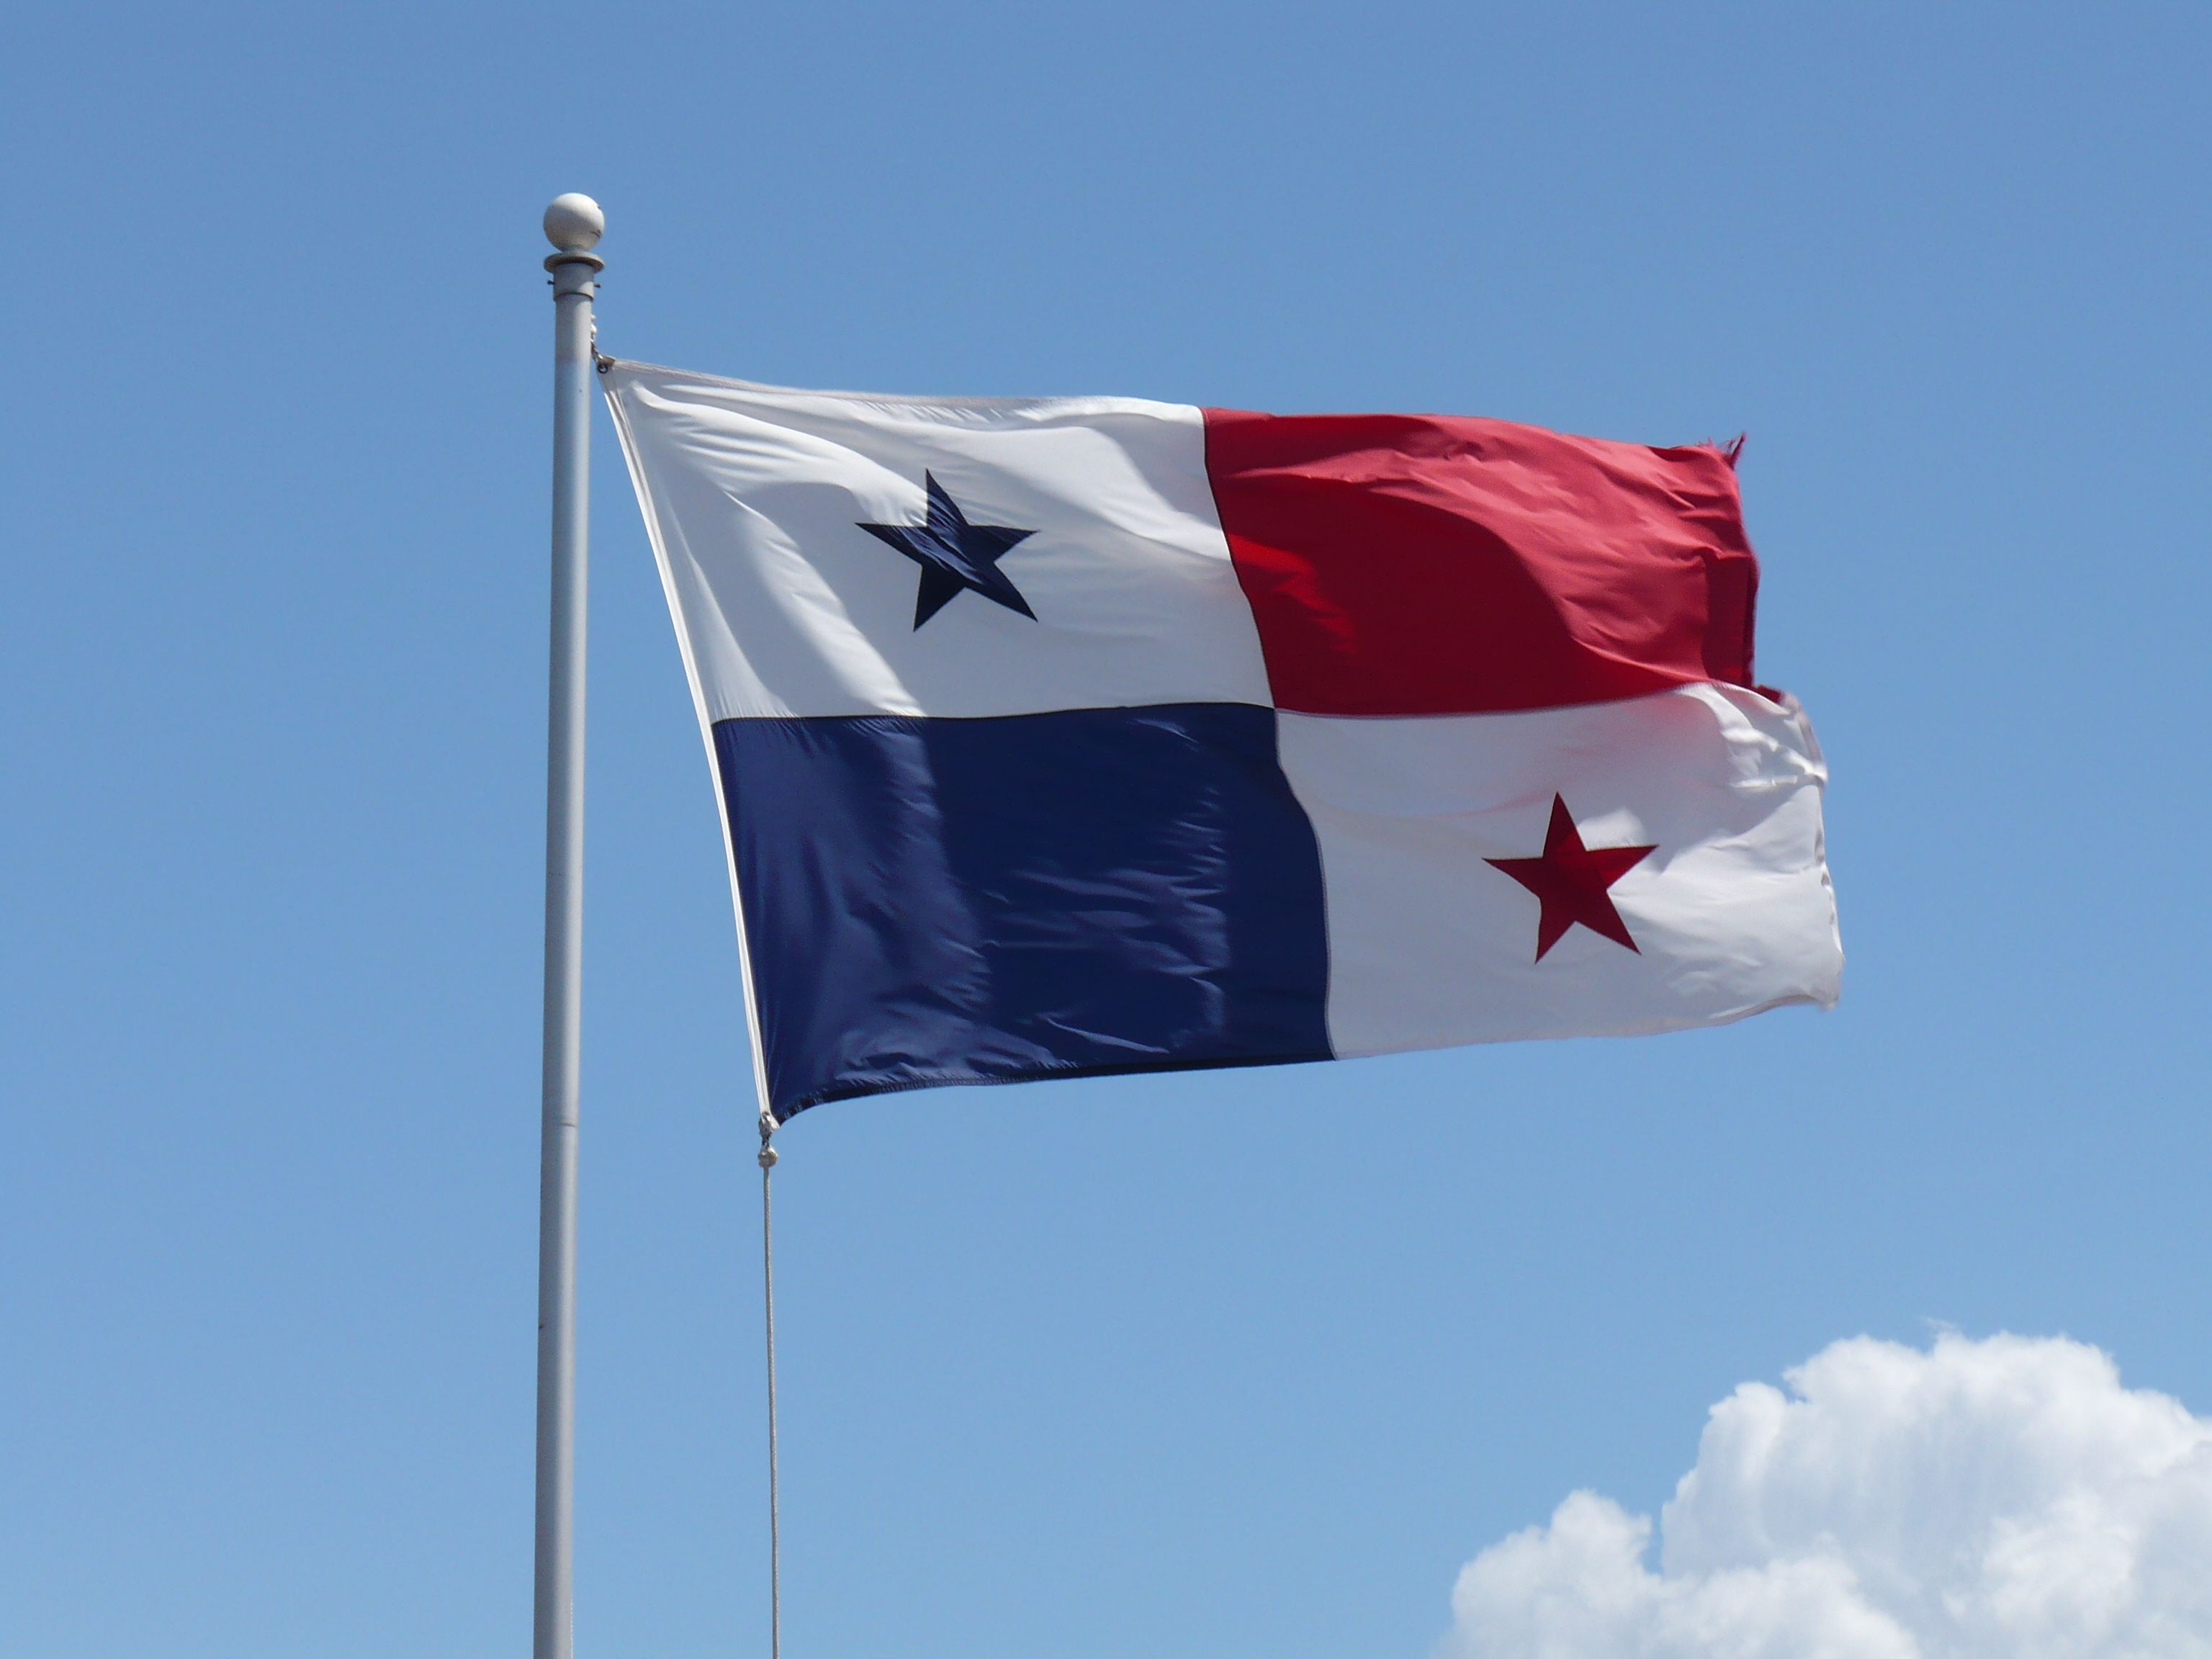 Comunicado De La Cancilleria De Panama Panama Flag Panama Flags Of The World